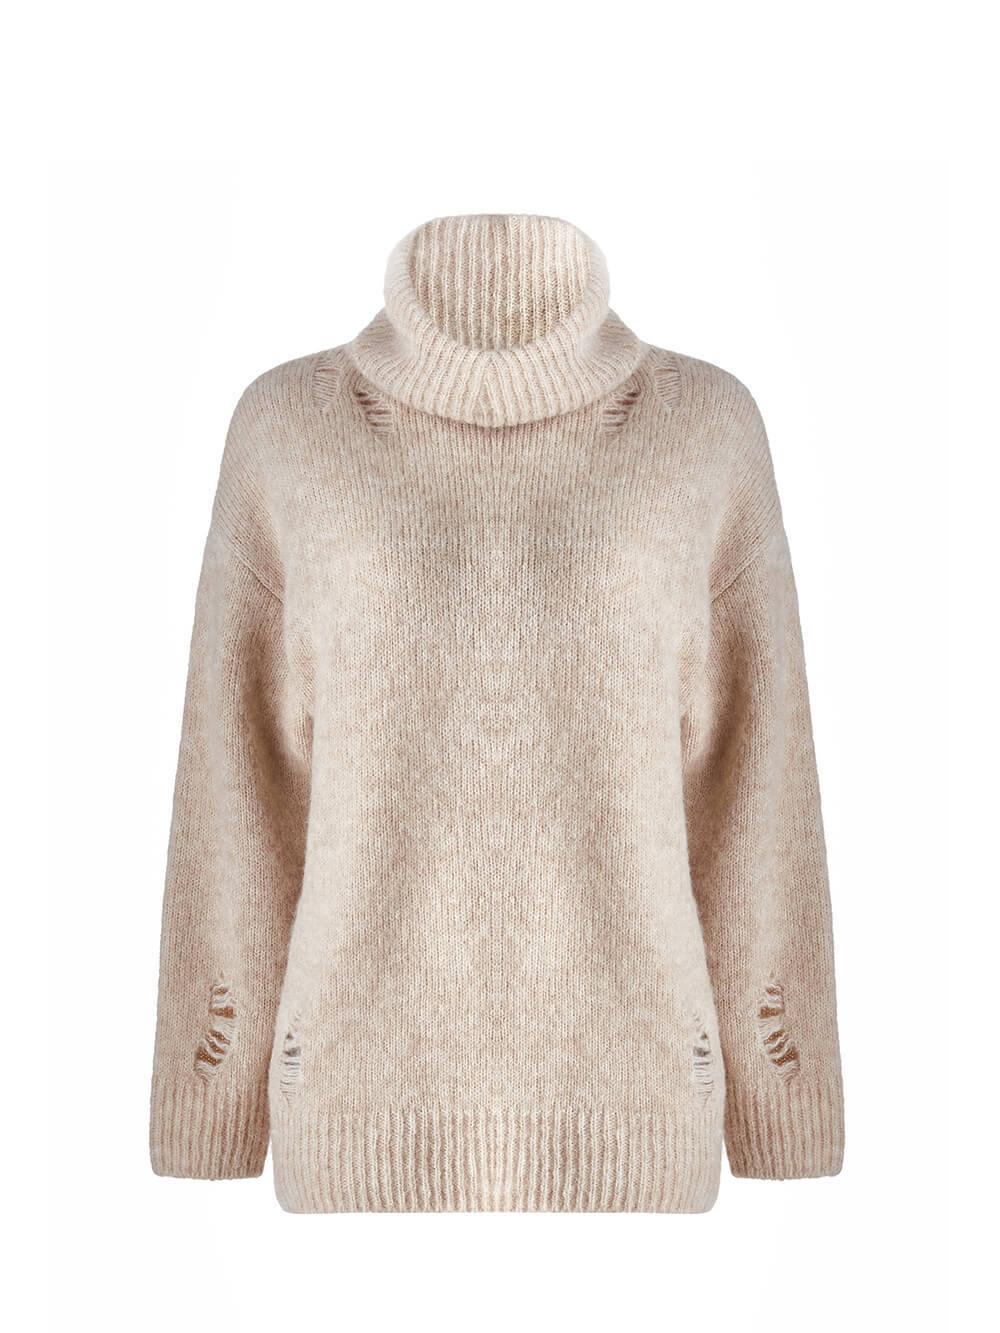 Женский свитер бежевого цвета из шерсти - фото 1